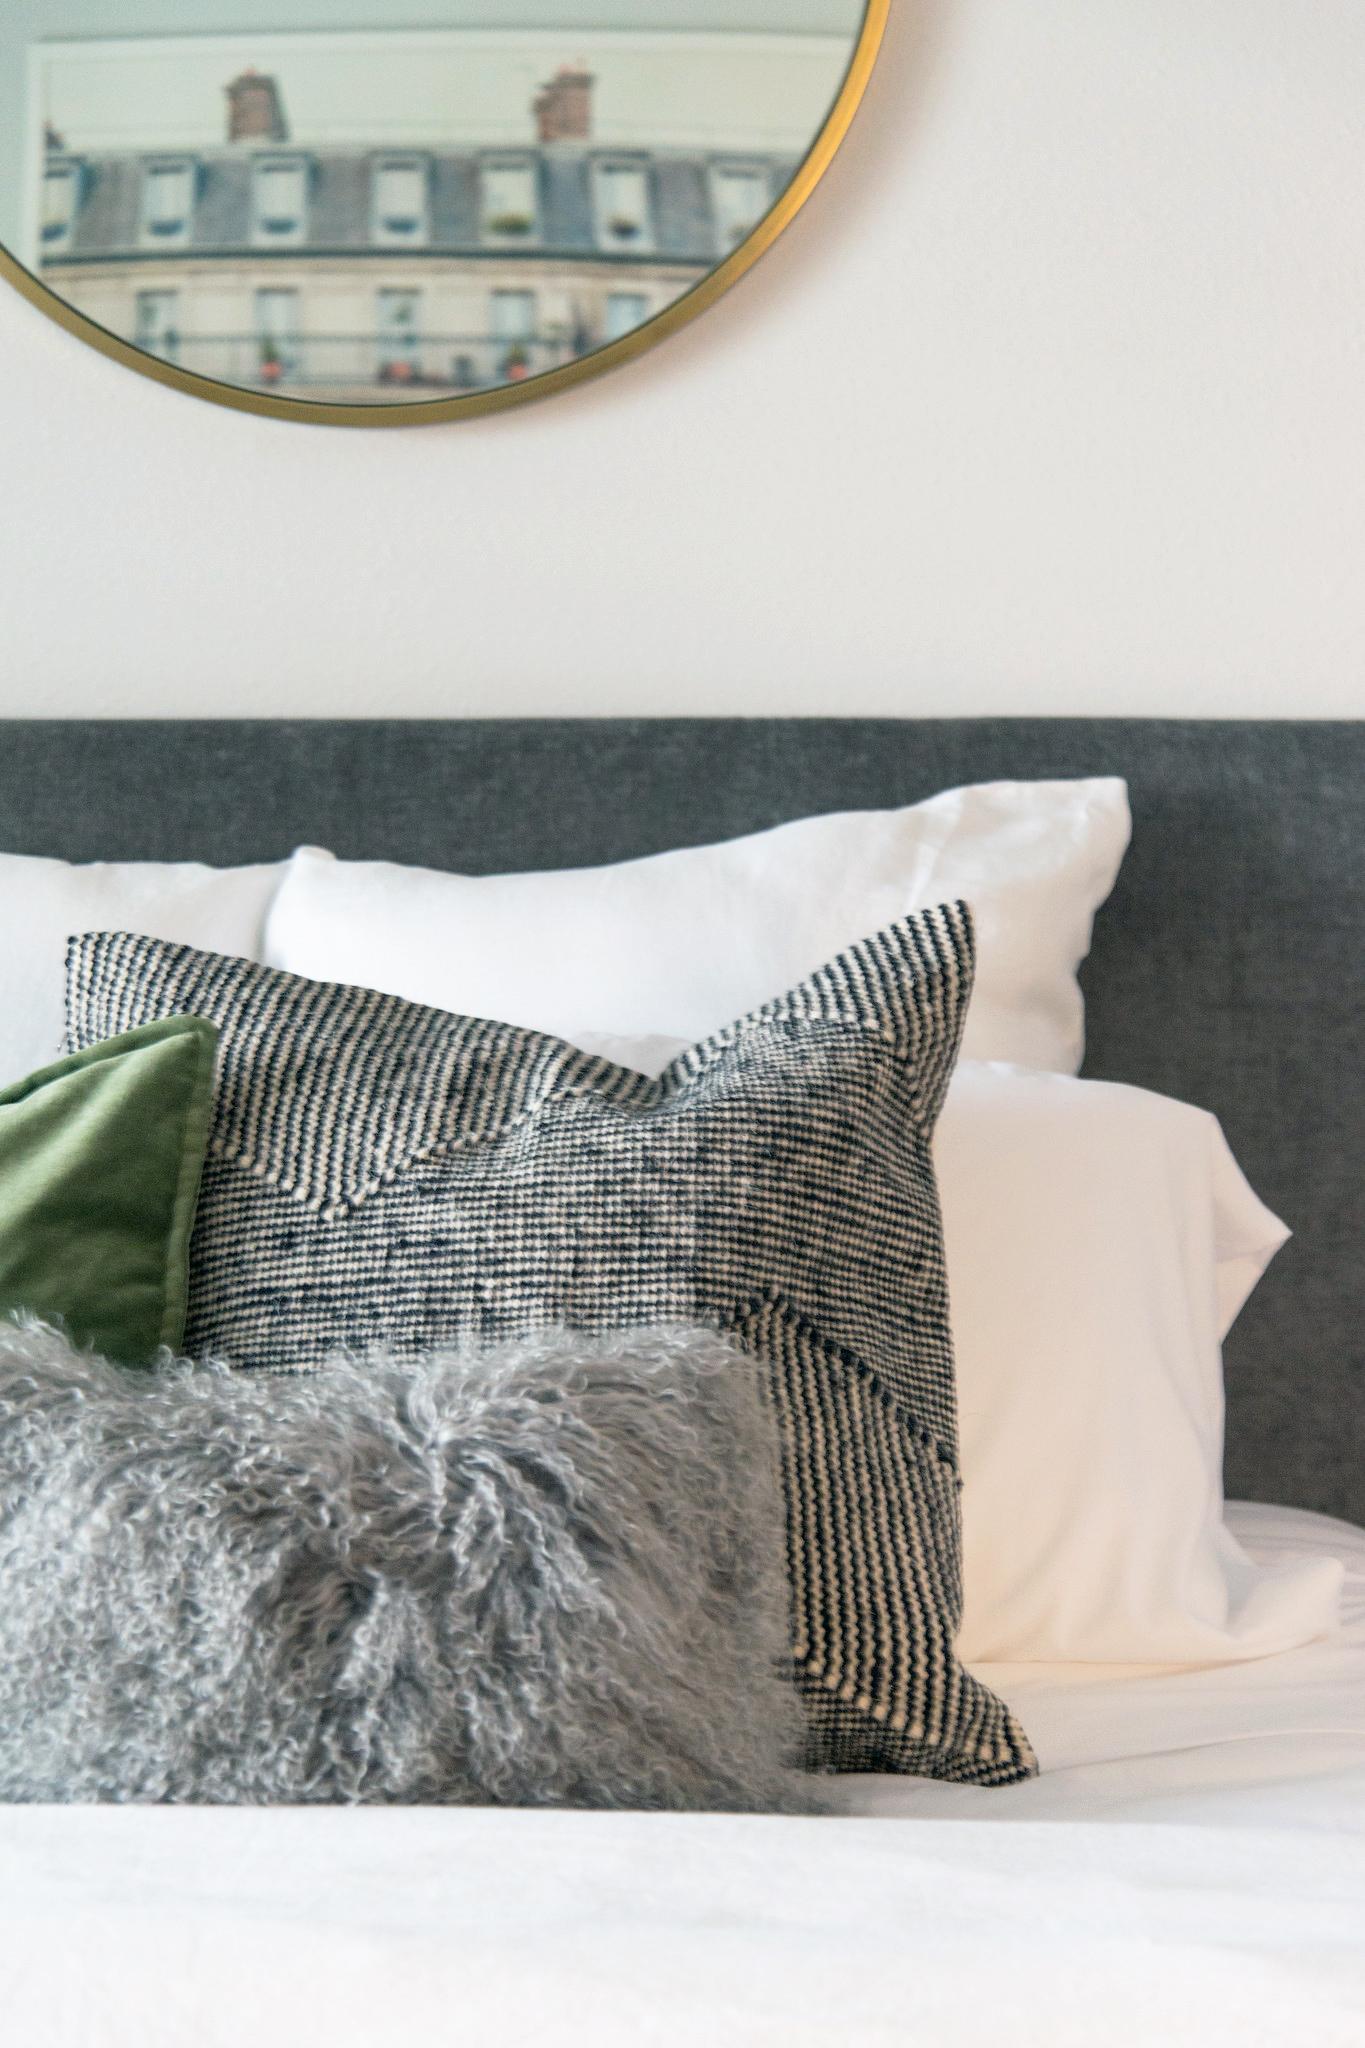 Seattle Bedroom Interior Decor and design